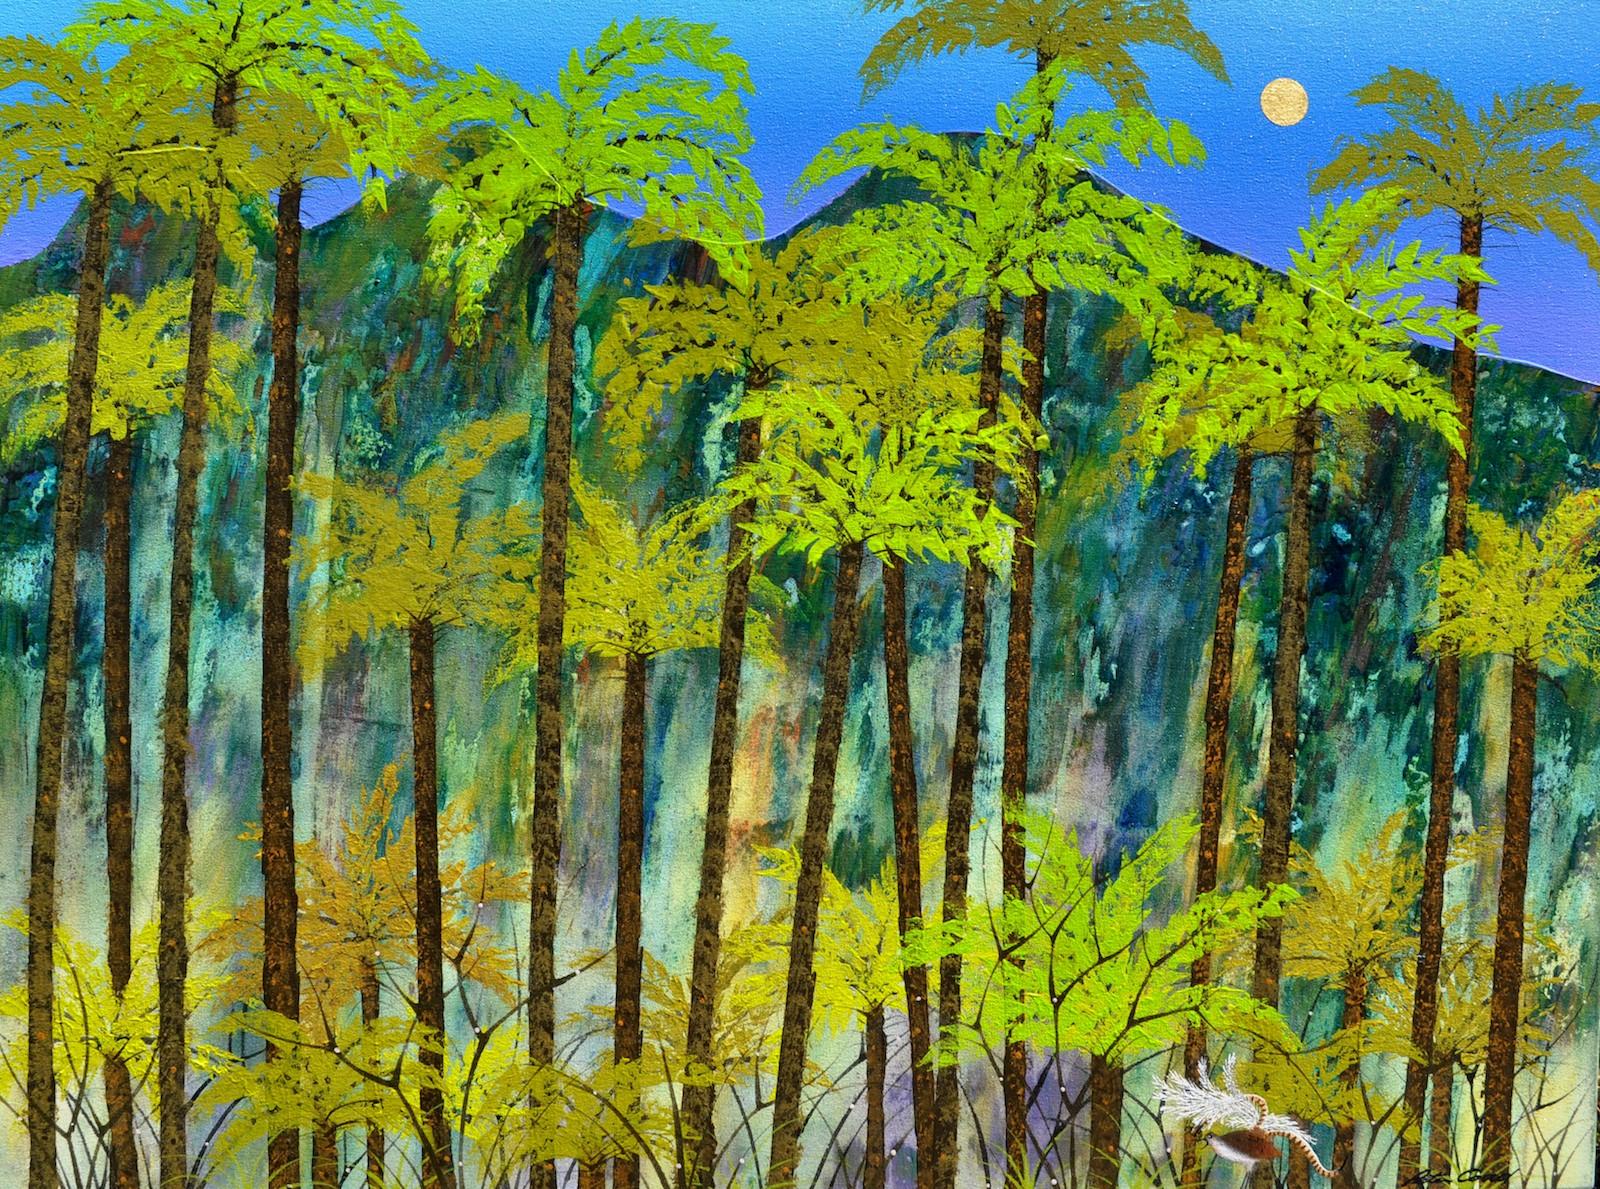 Peter Coad 'Lyre Bird Jamison Valley - Blue Mountains' 90cm x 120cm #14557